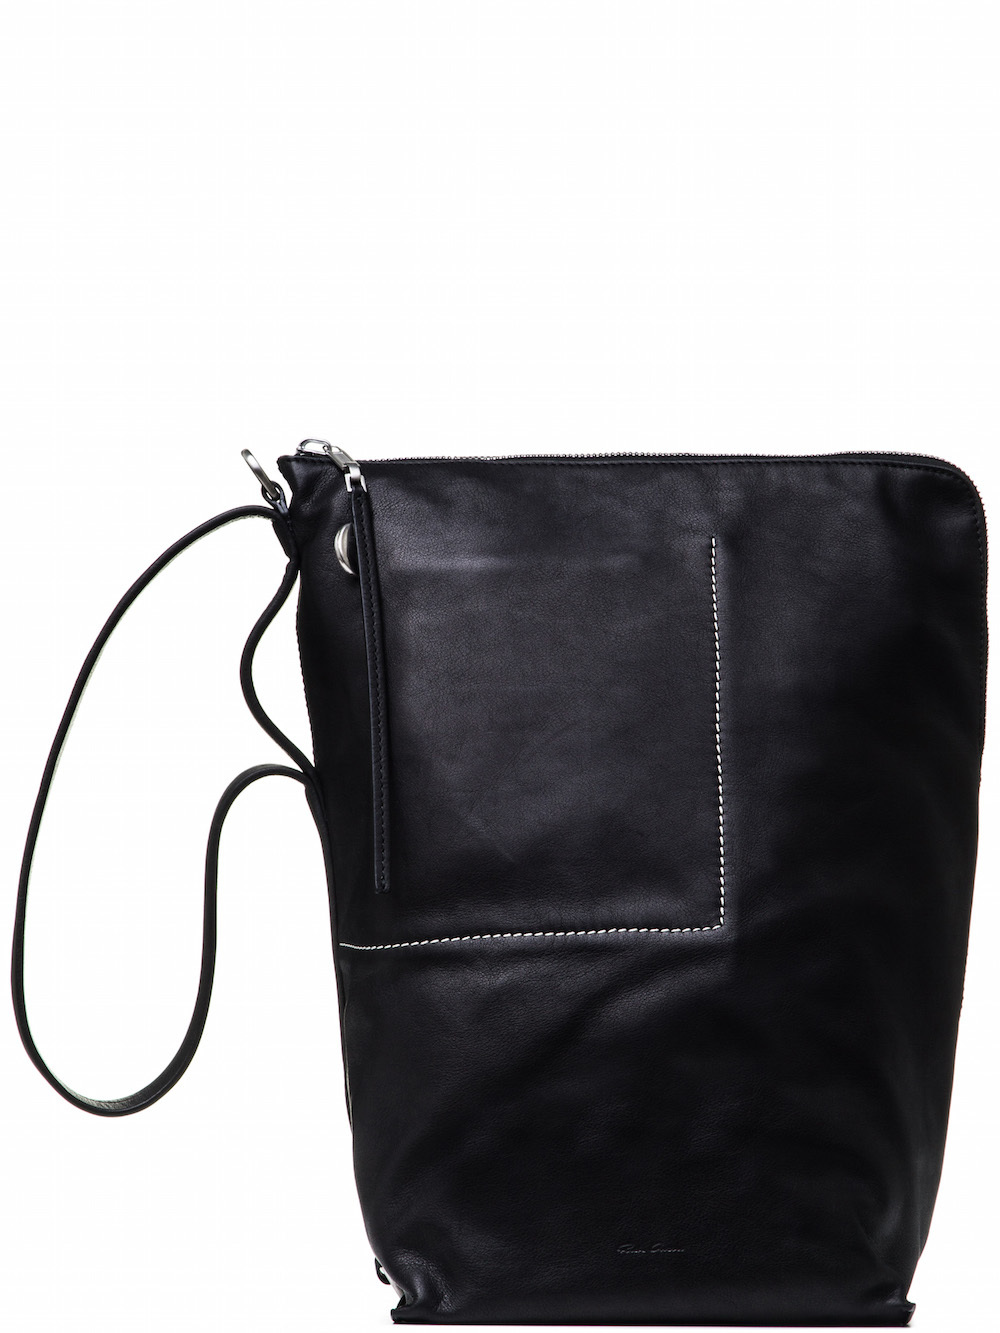 RICK OWENS BUCKET BAG IN BLACK CALF LEATHER